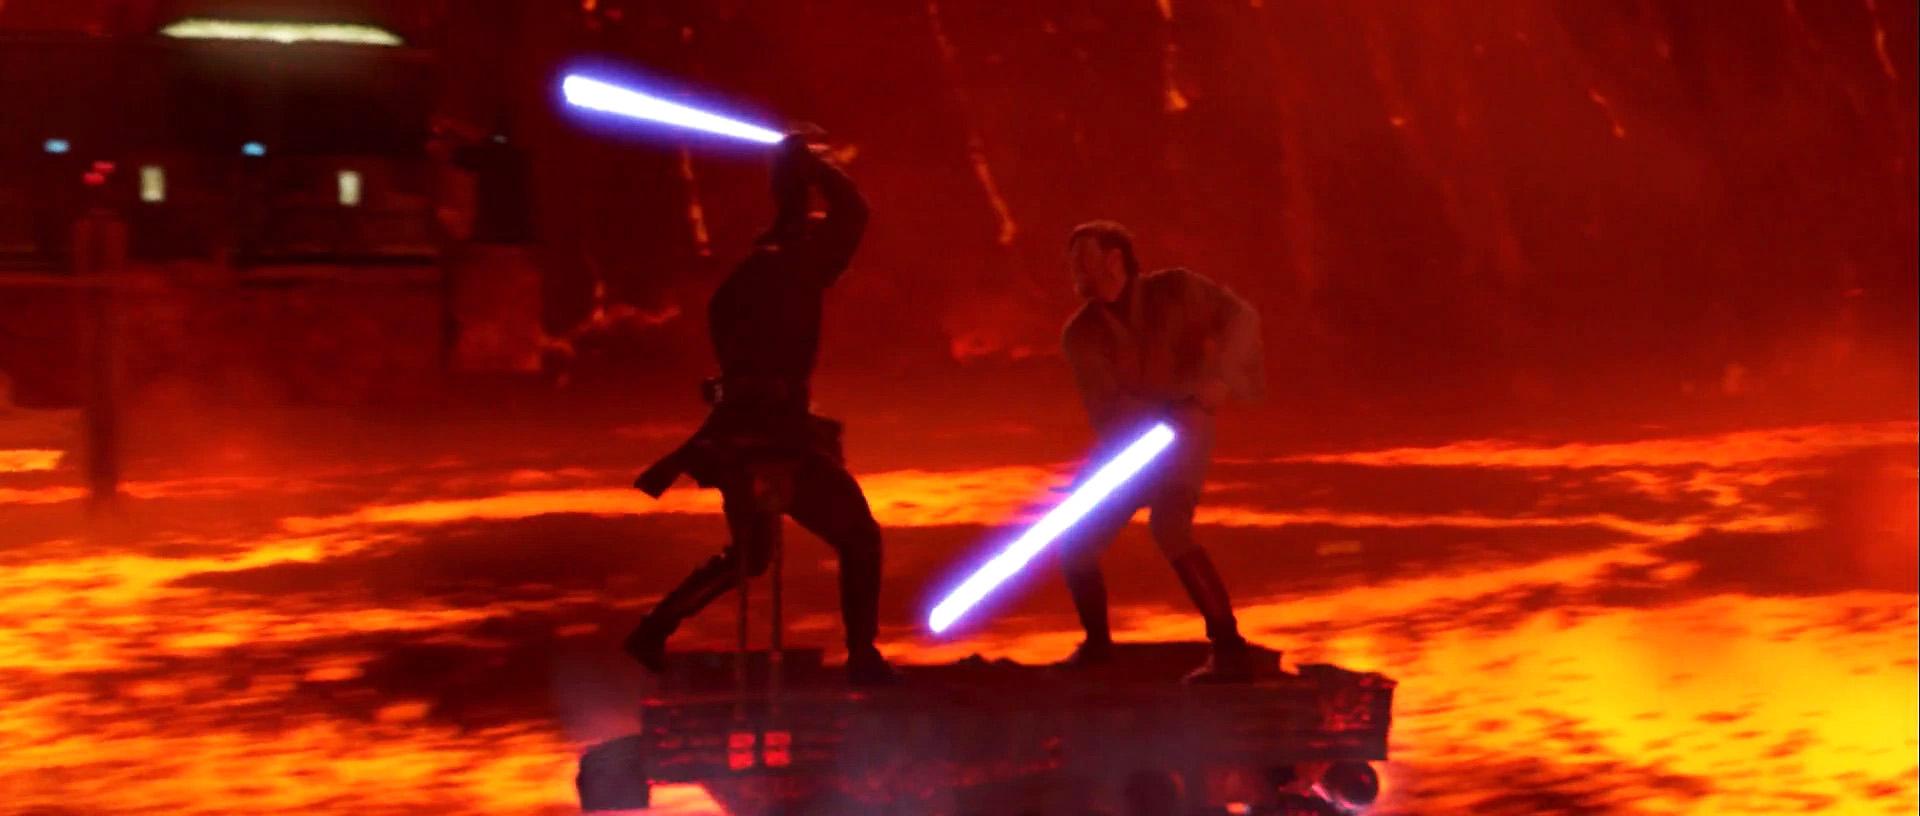 Pin The Clone Wars Anakin Vs Obi Wan Kenobi 1920x816